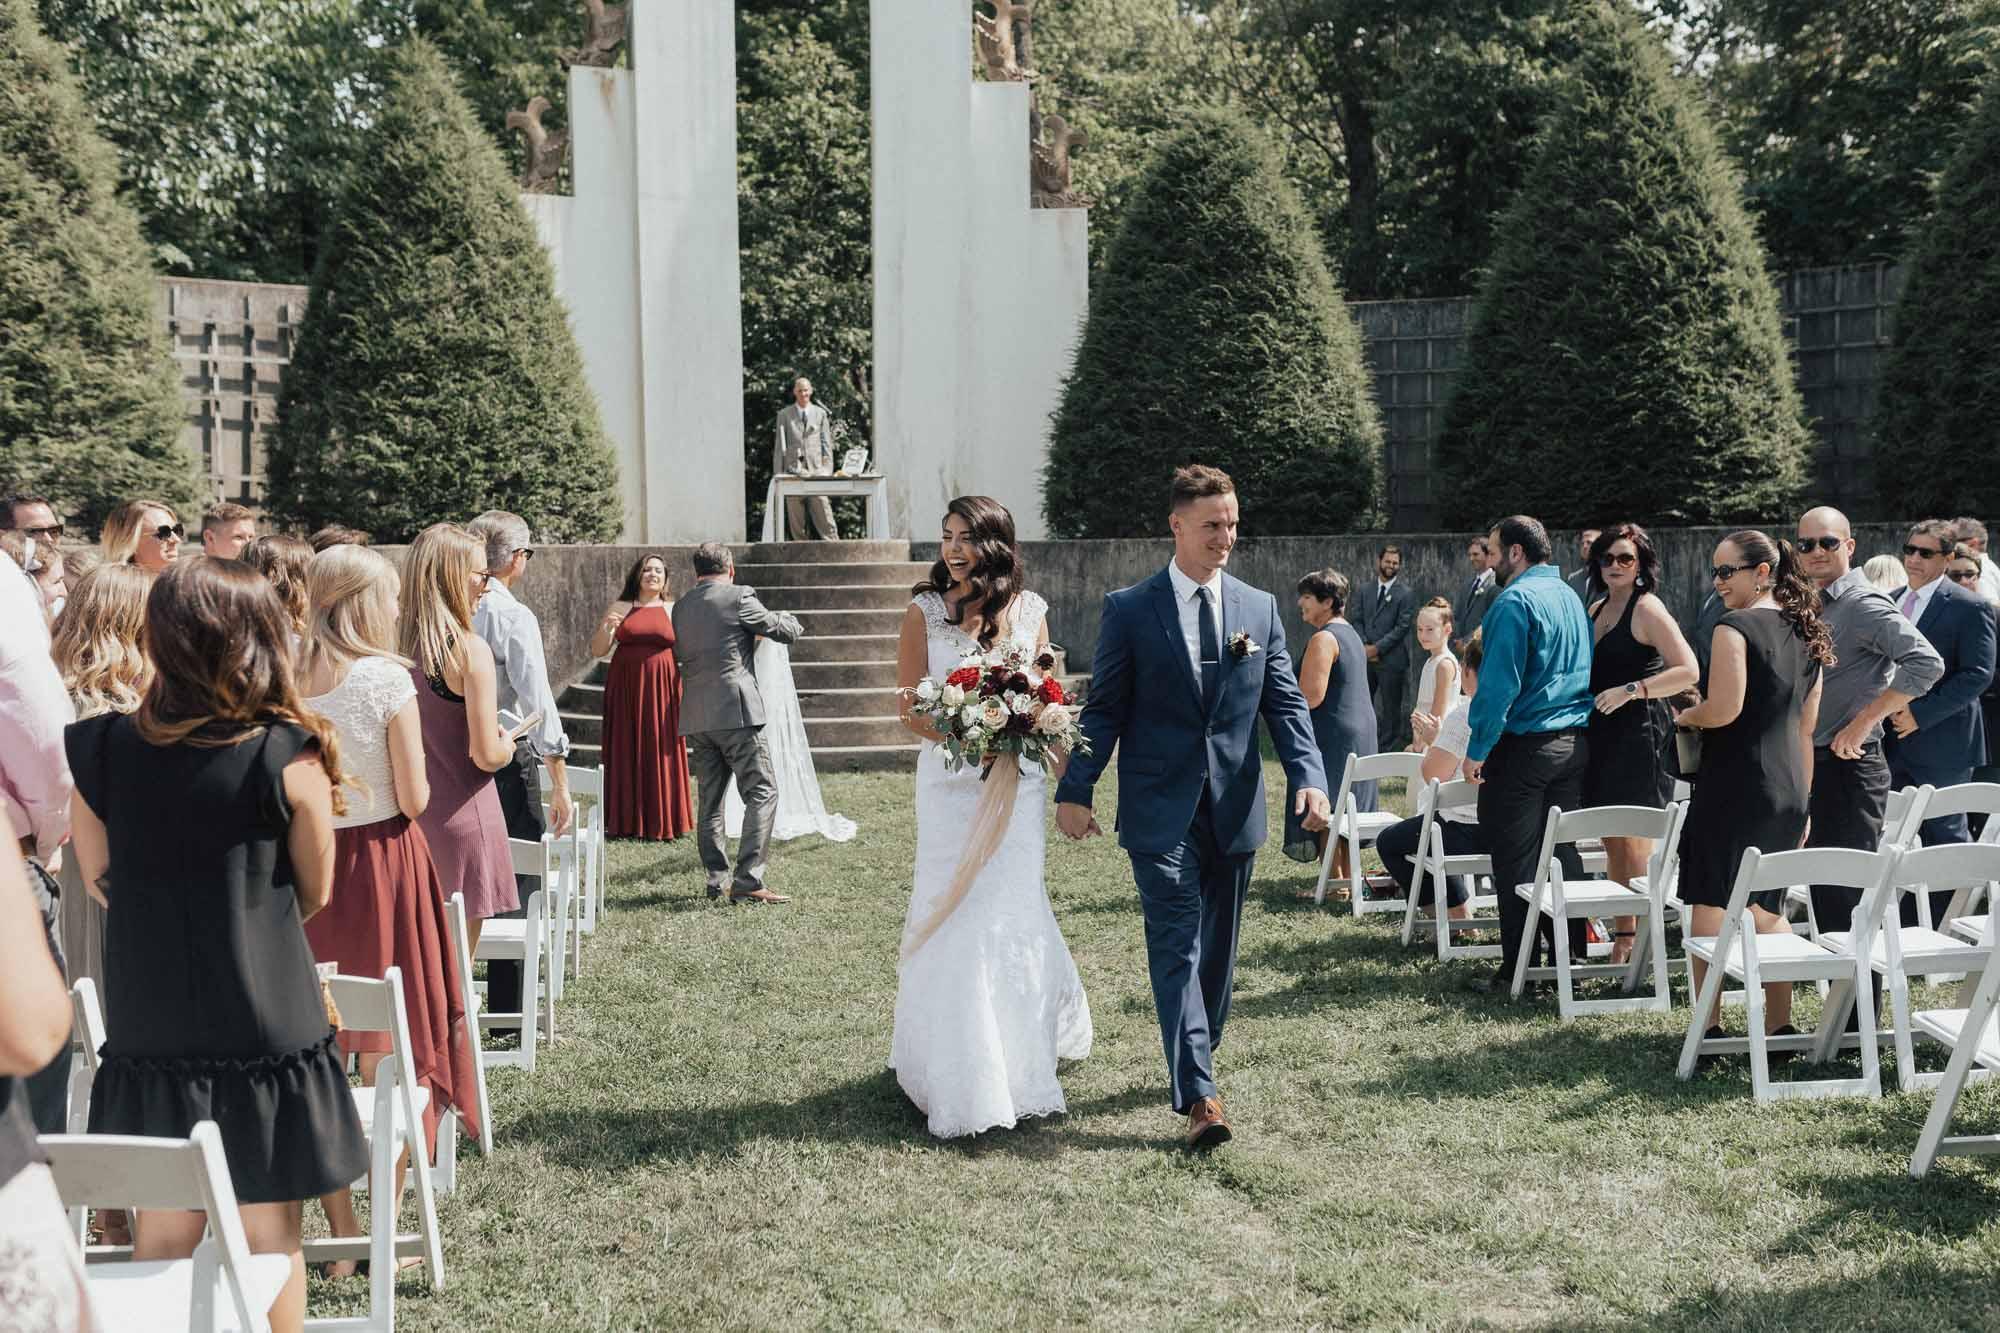 champaign_il_wedding_photography-0341.jpg